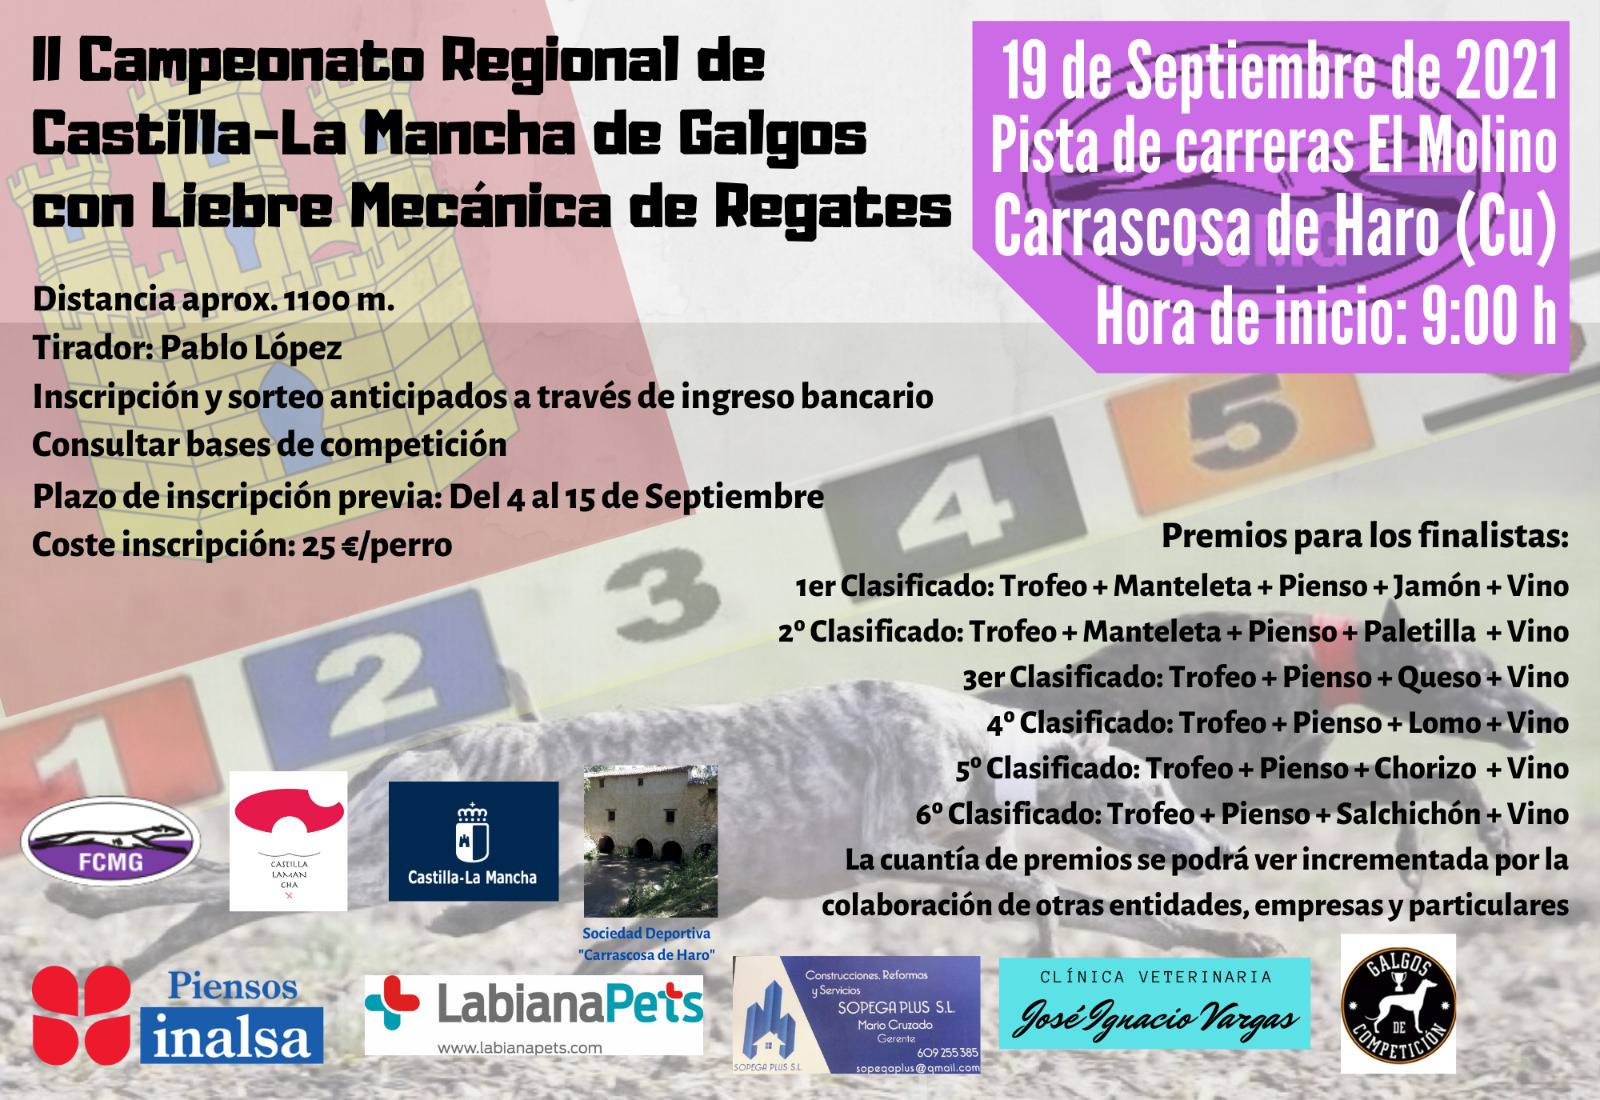 Campeonato regional de liebre mecánica de regates